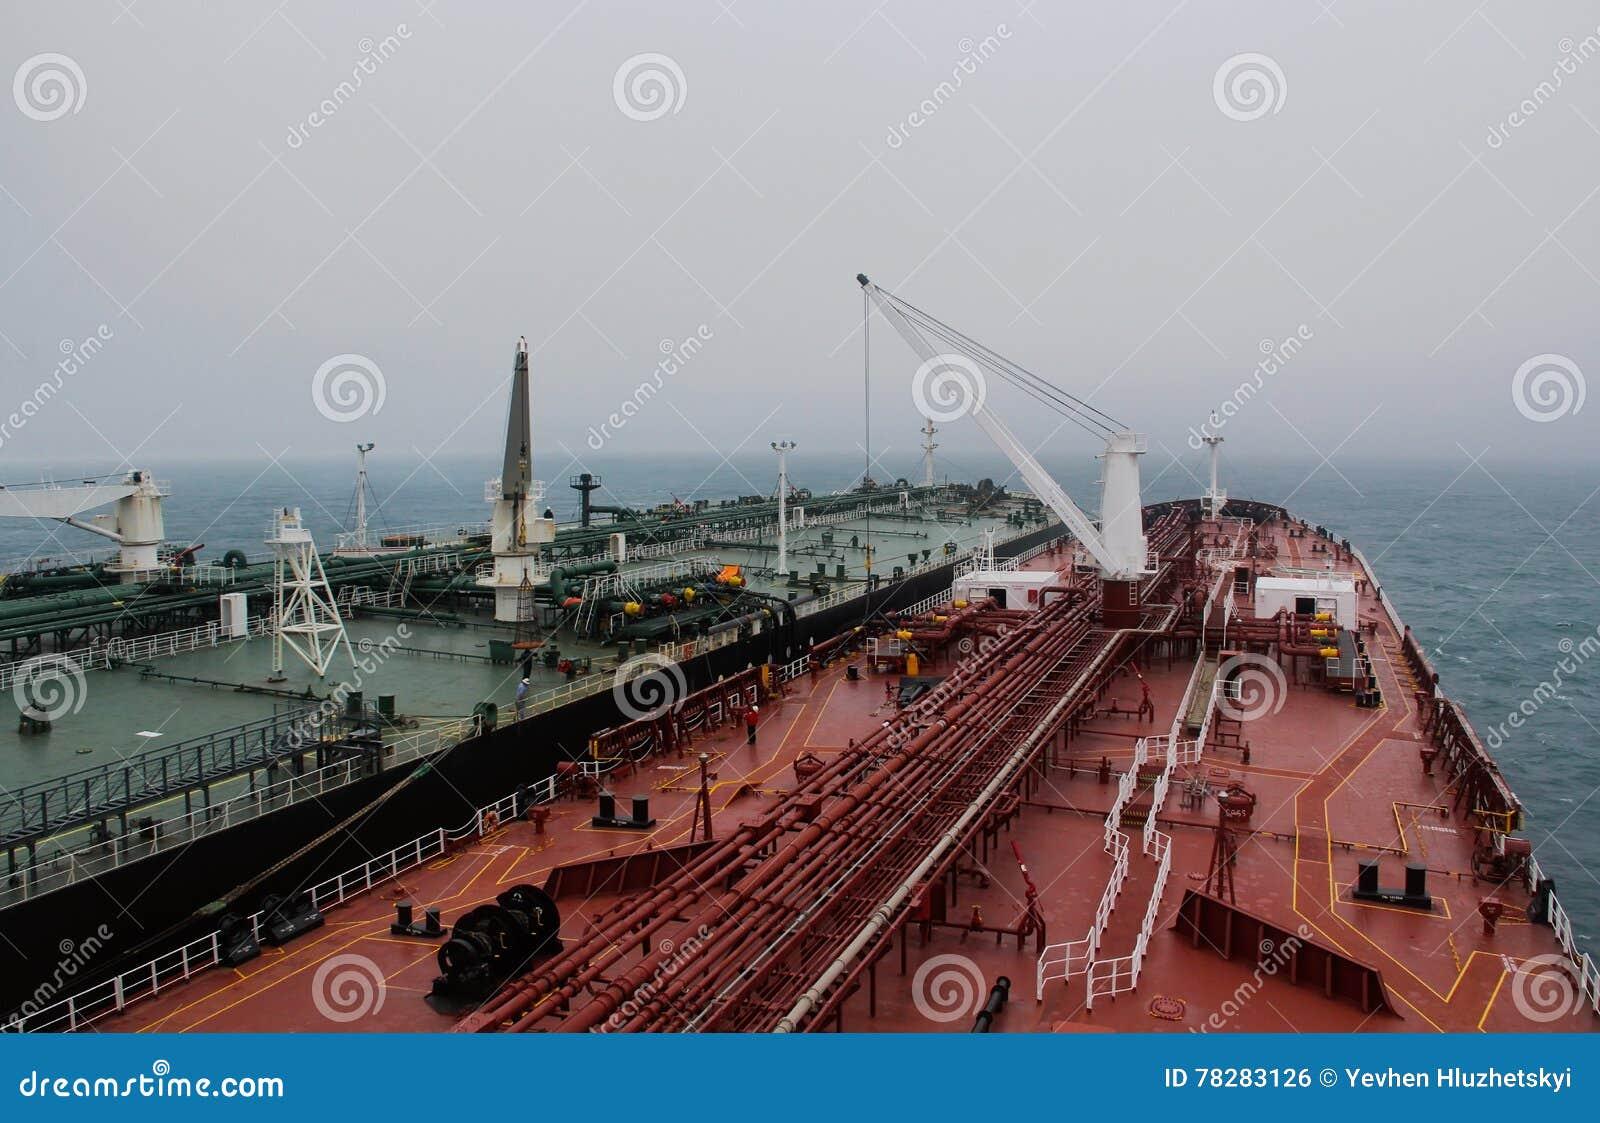 Ship To Ship Operation